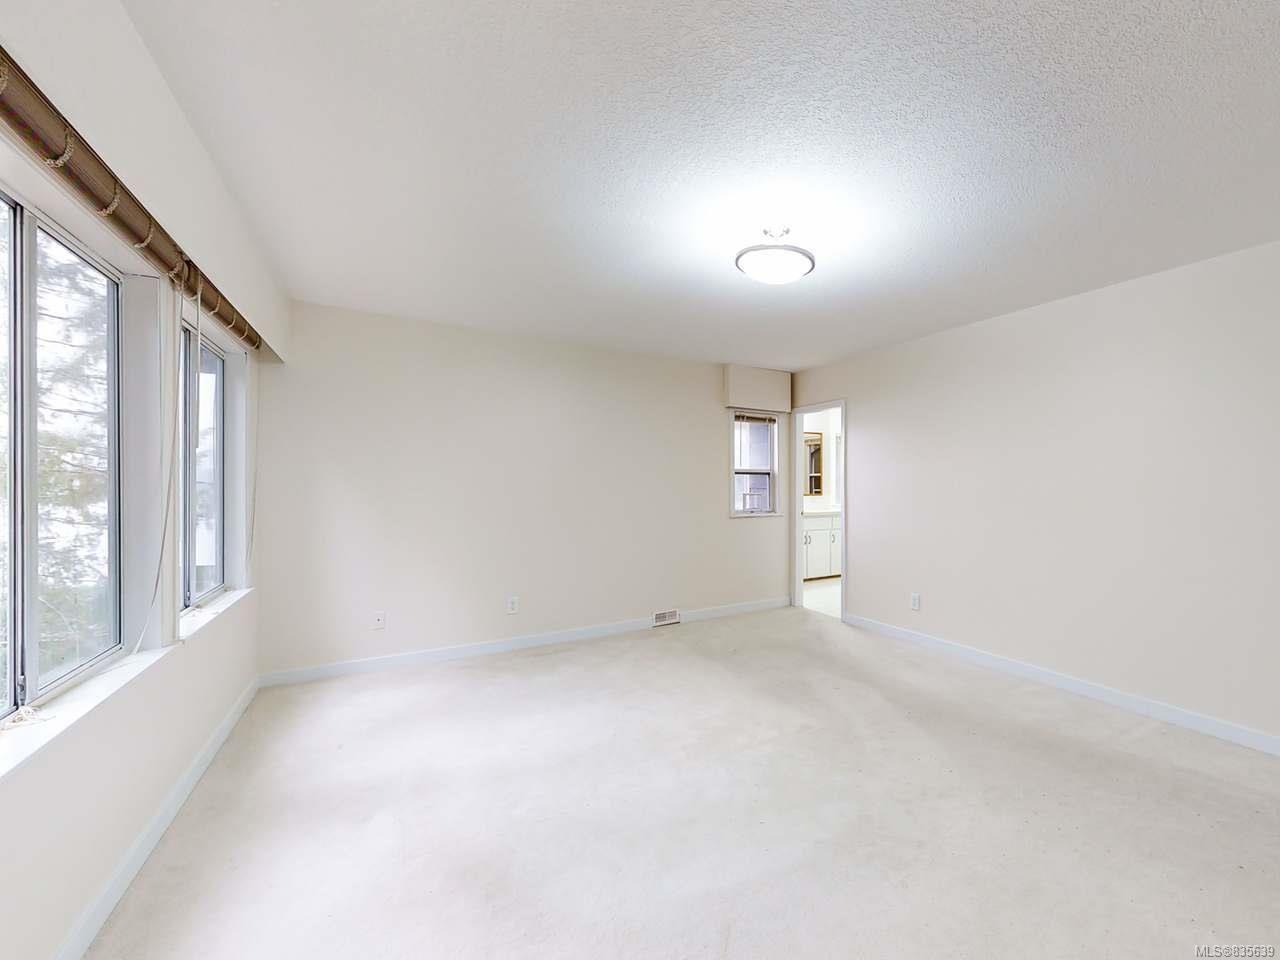 Photo 24: Photos: 9657 Faber Rd in PORT ALBERNI: PA Sproat Lake House for sale (Port Alberni)  : MLS®# 835639